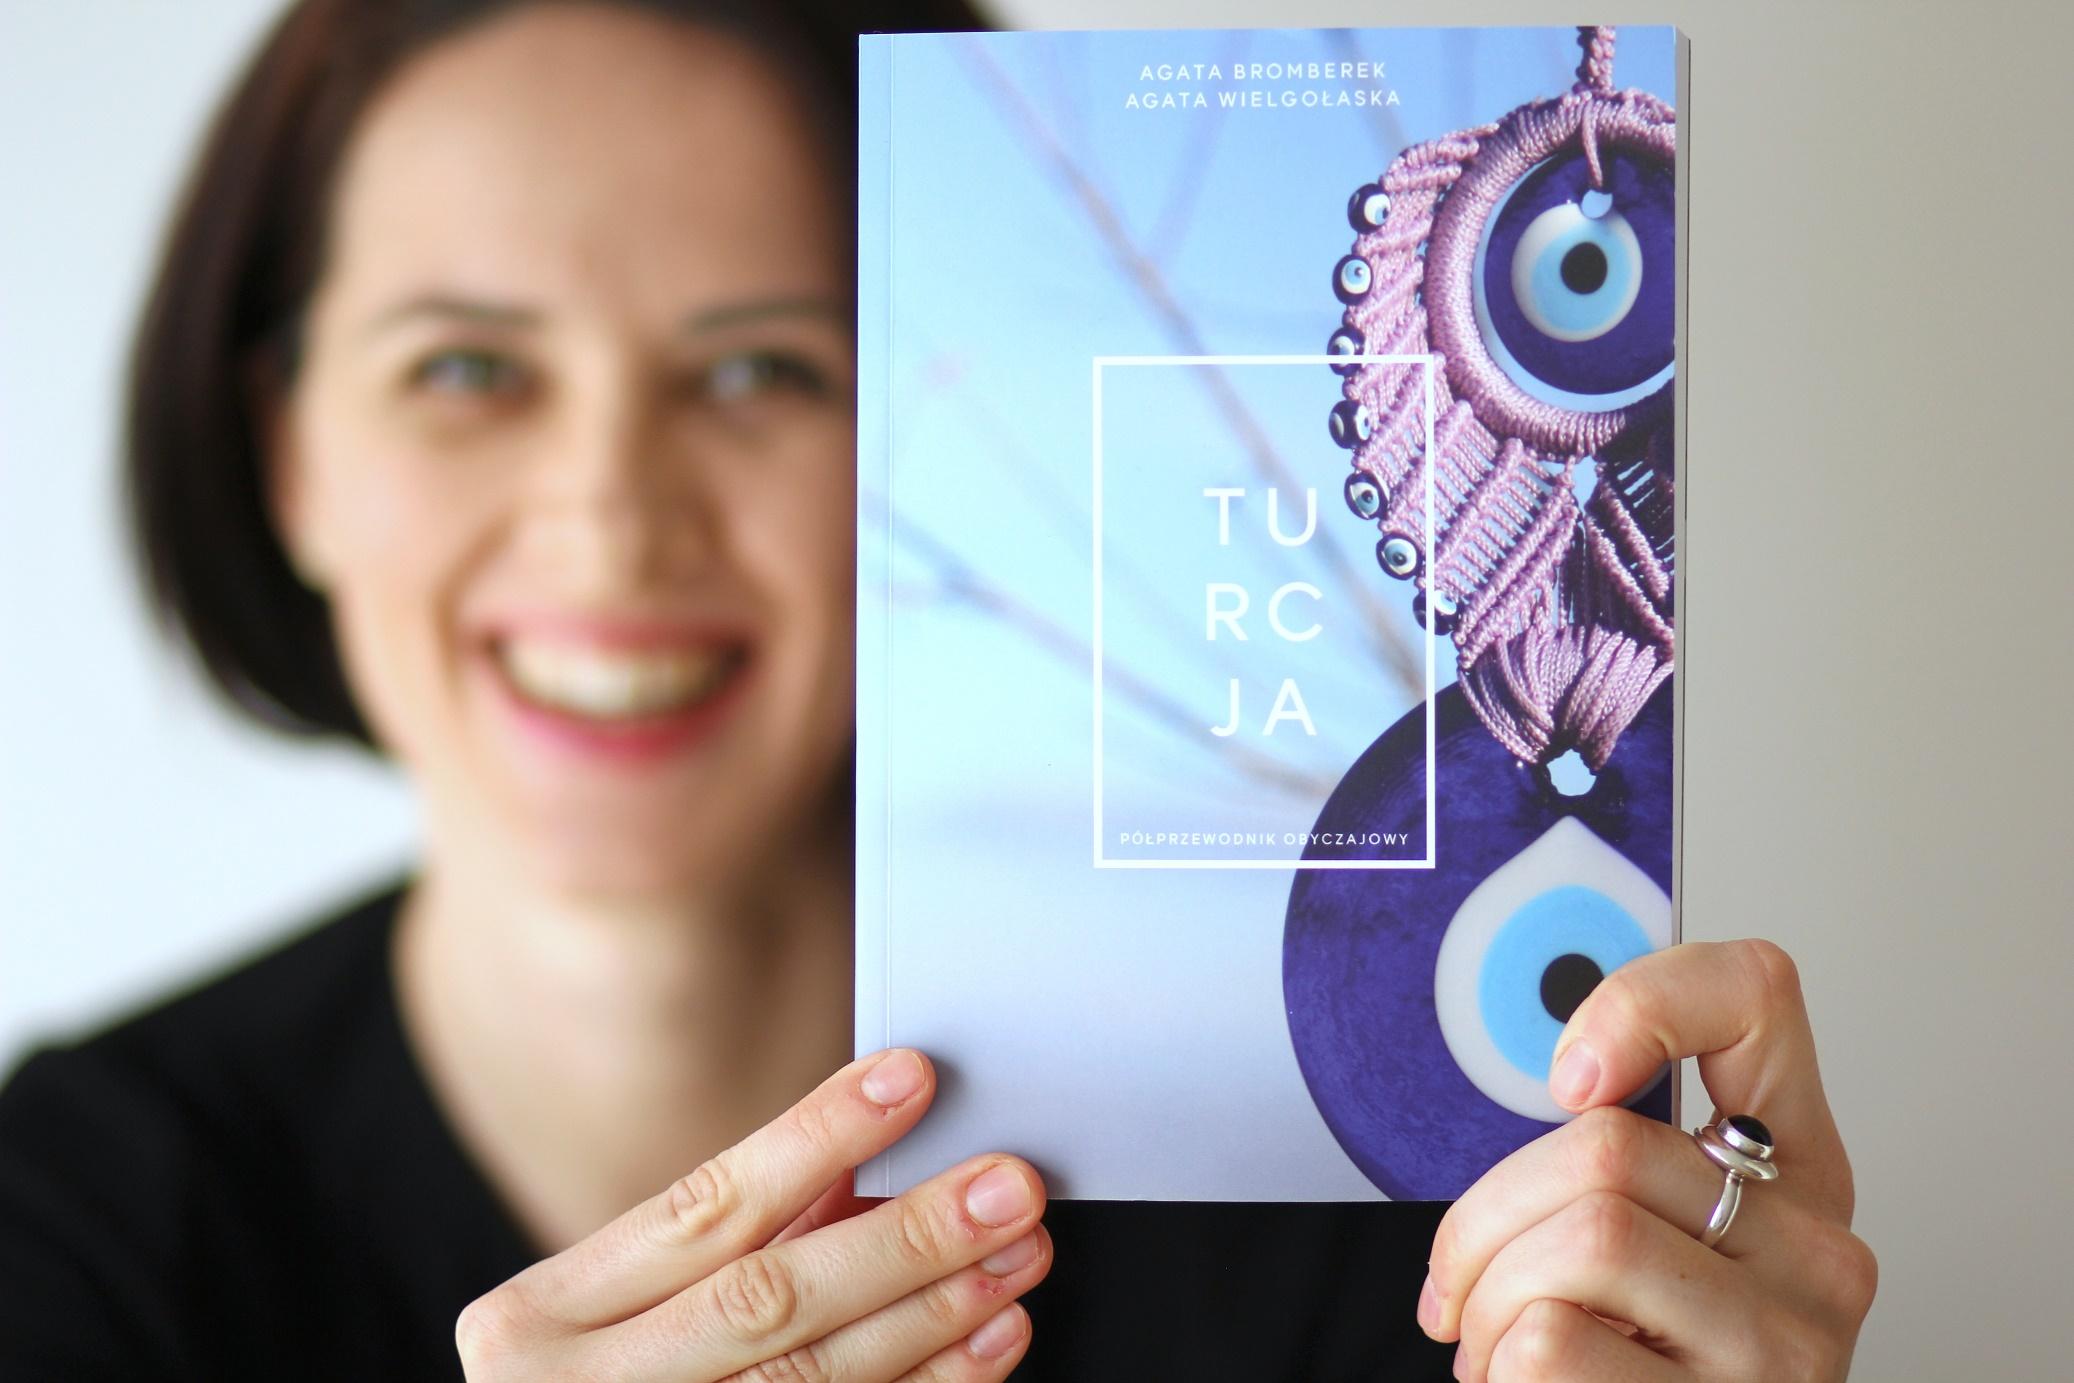 turcja, książka o Turcji, Turcja półprzewodnik